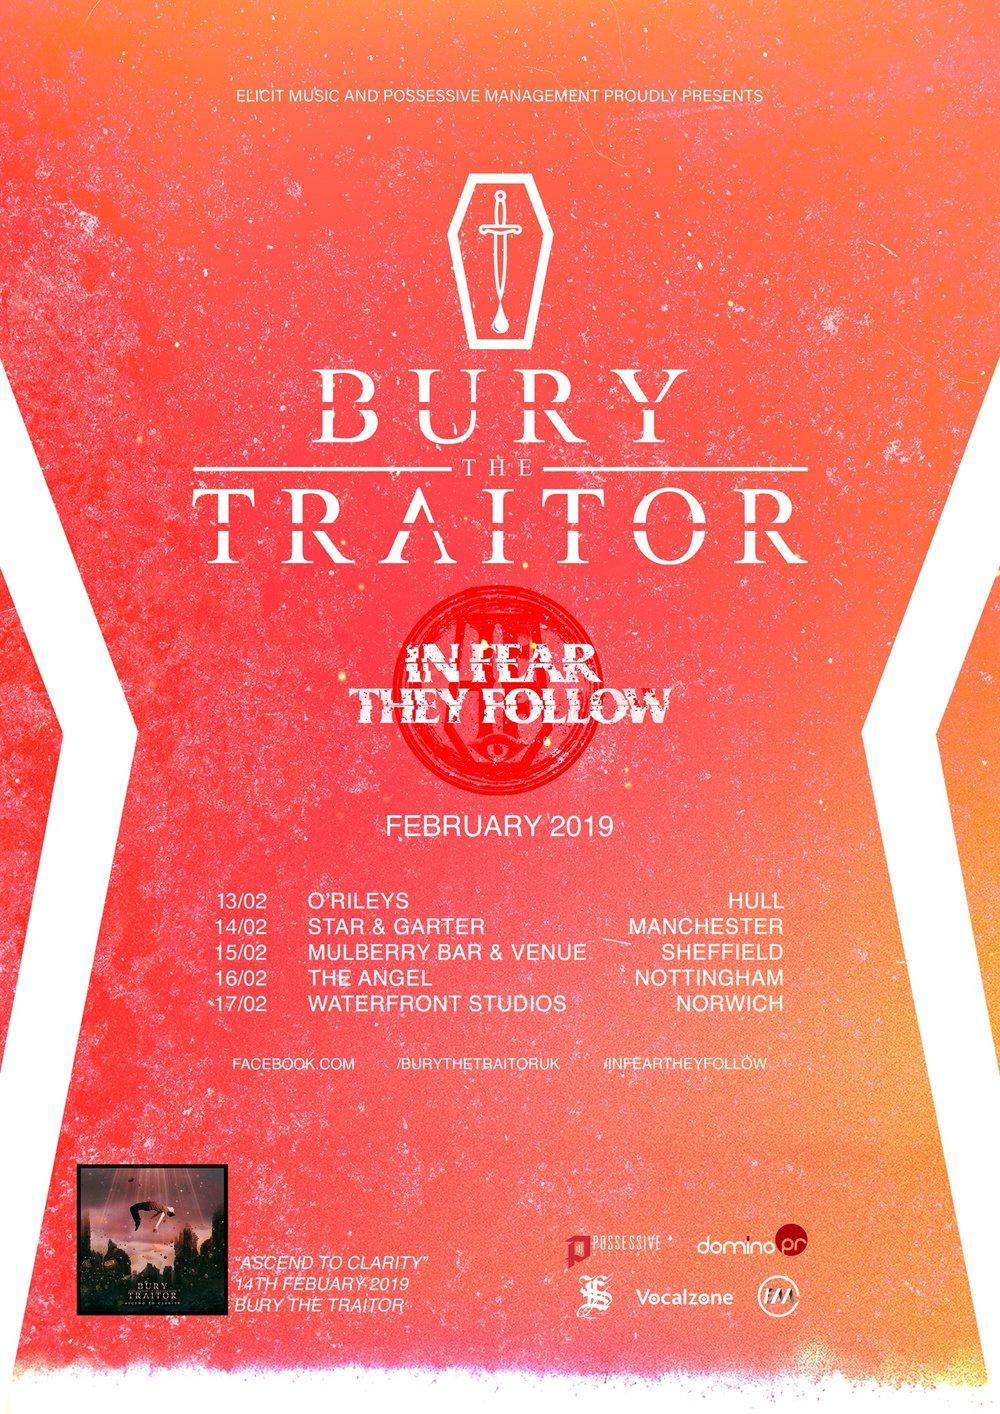 Bury The Traitor Star and Garter UK tour Dates 2019